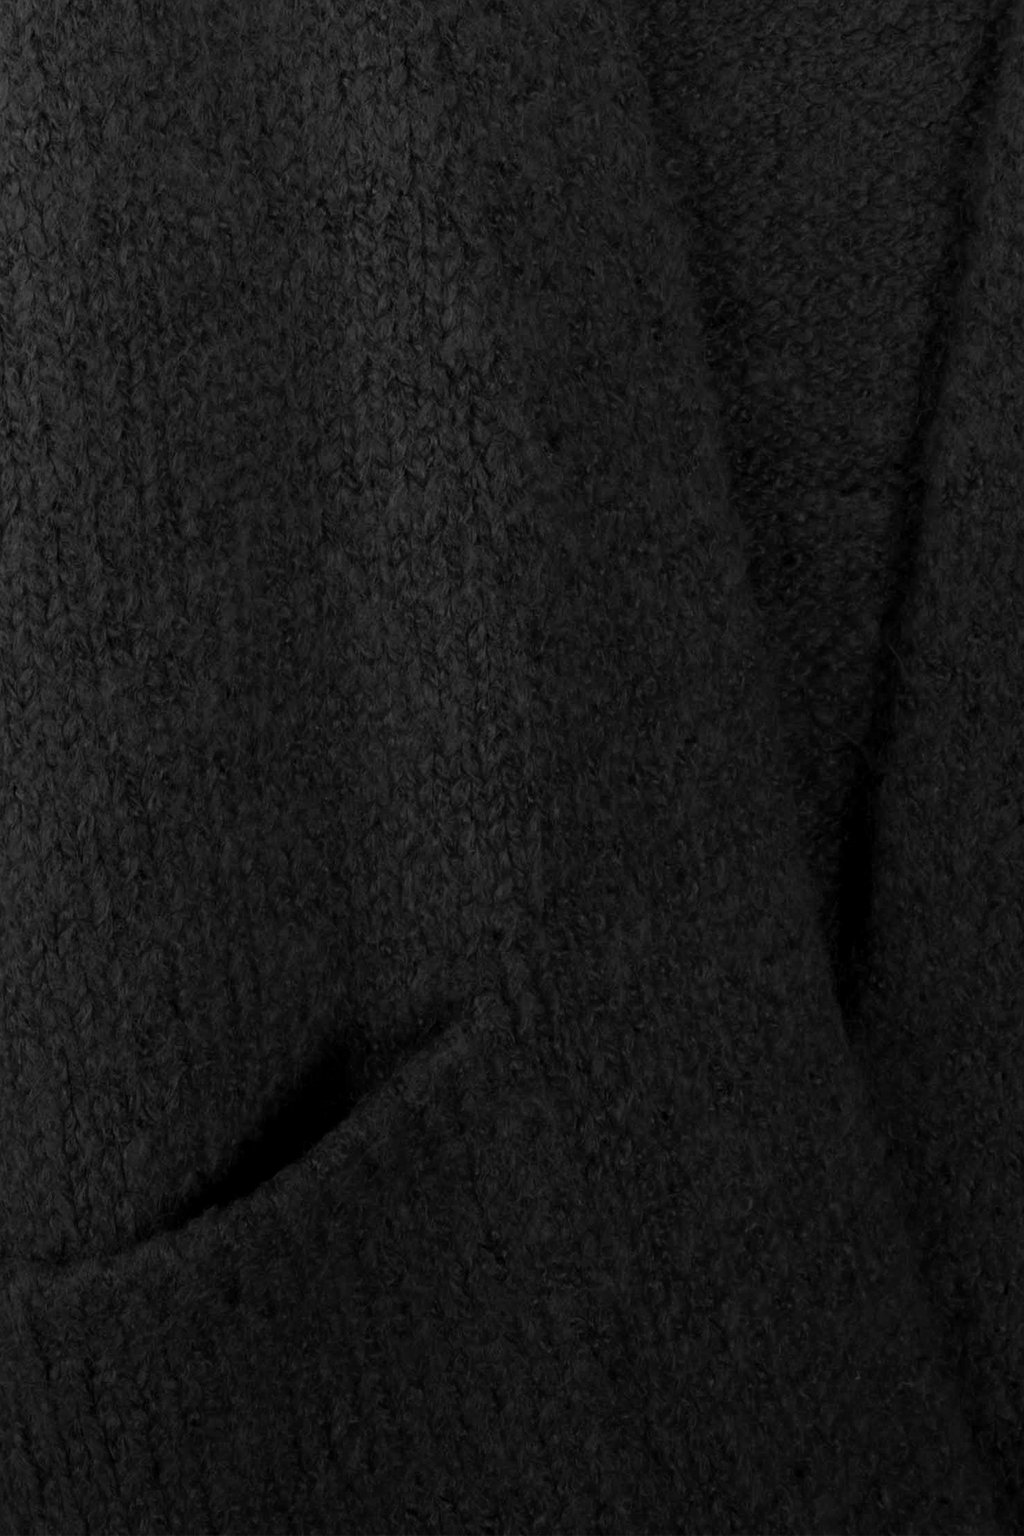 Cardigan 1778 Black 10